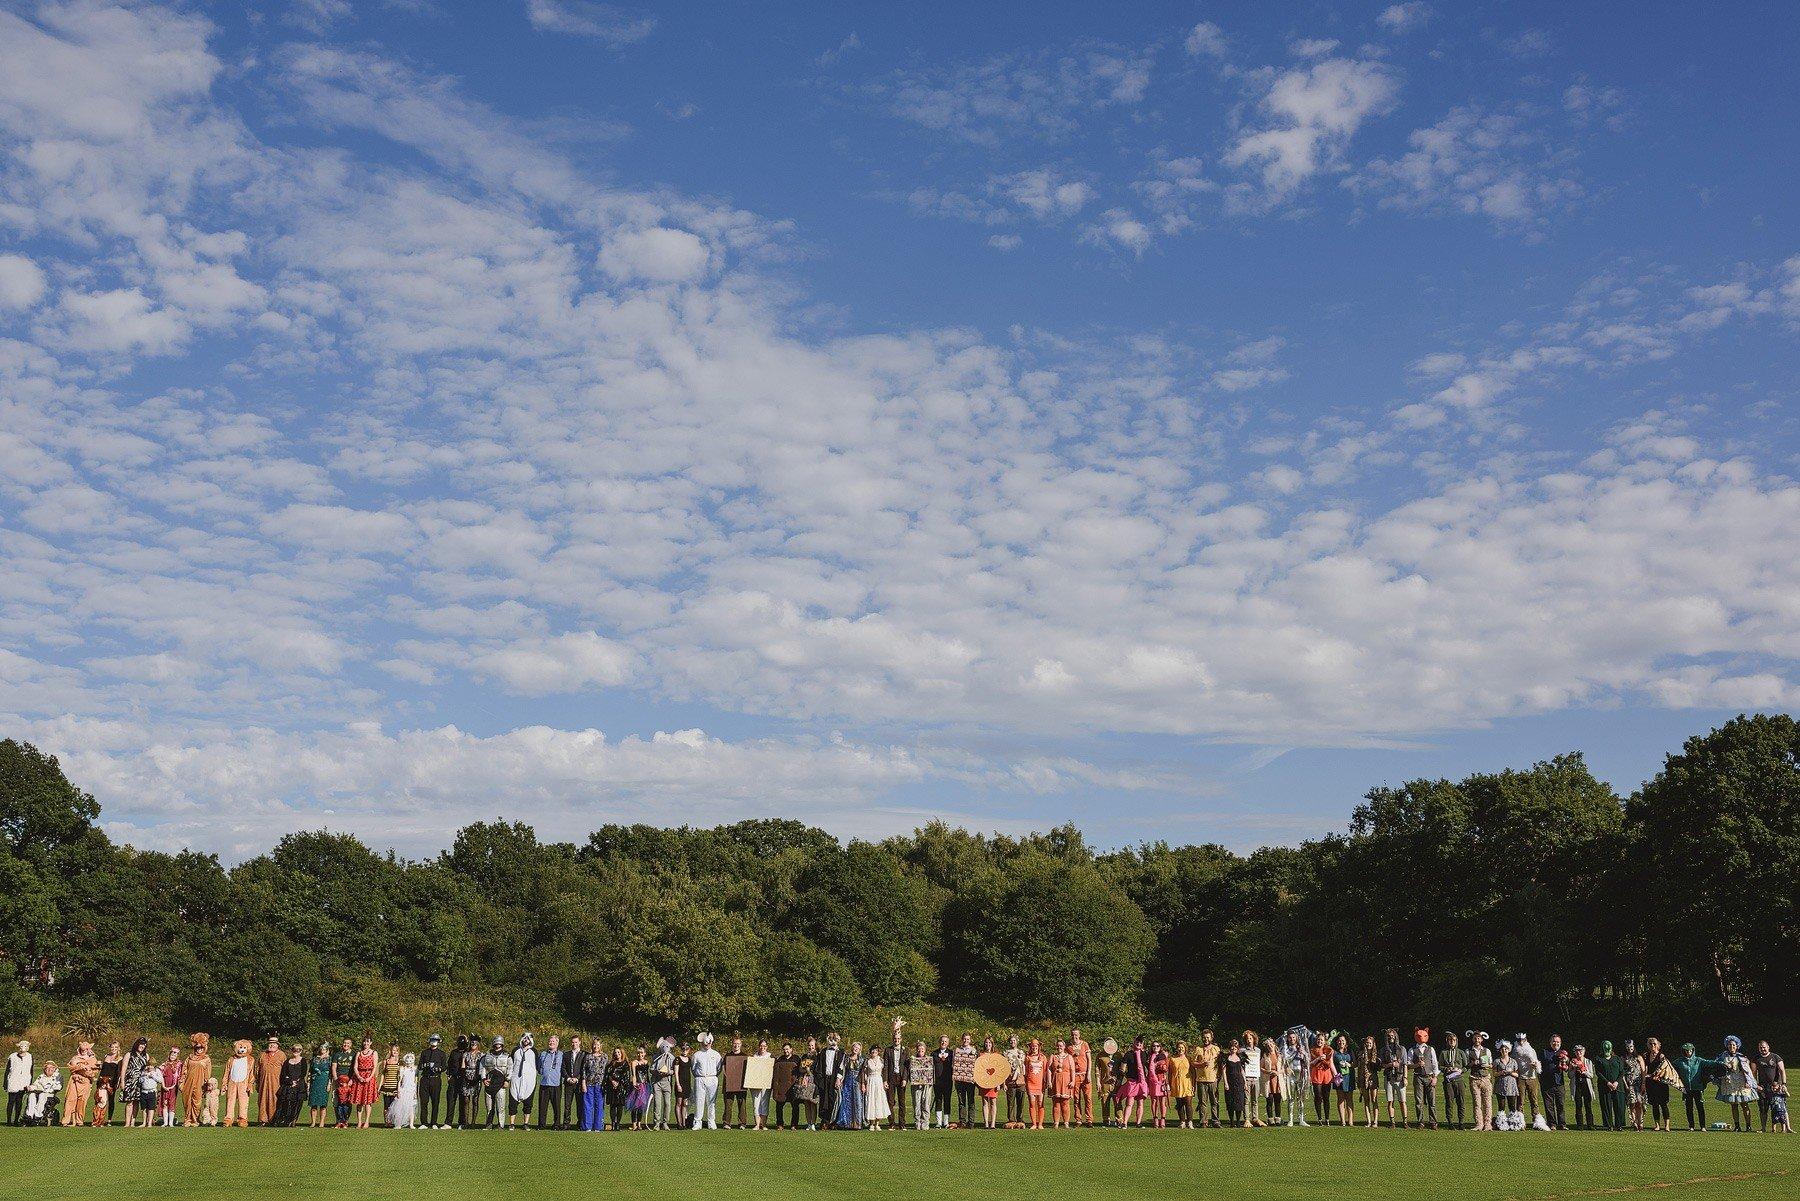 fancy dress wedding group photograph